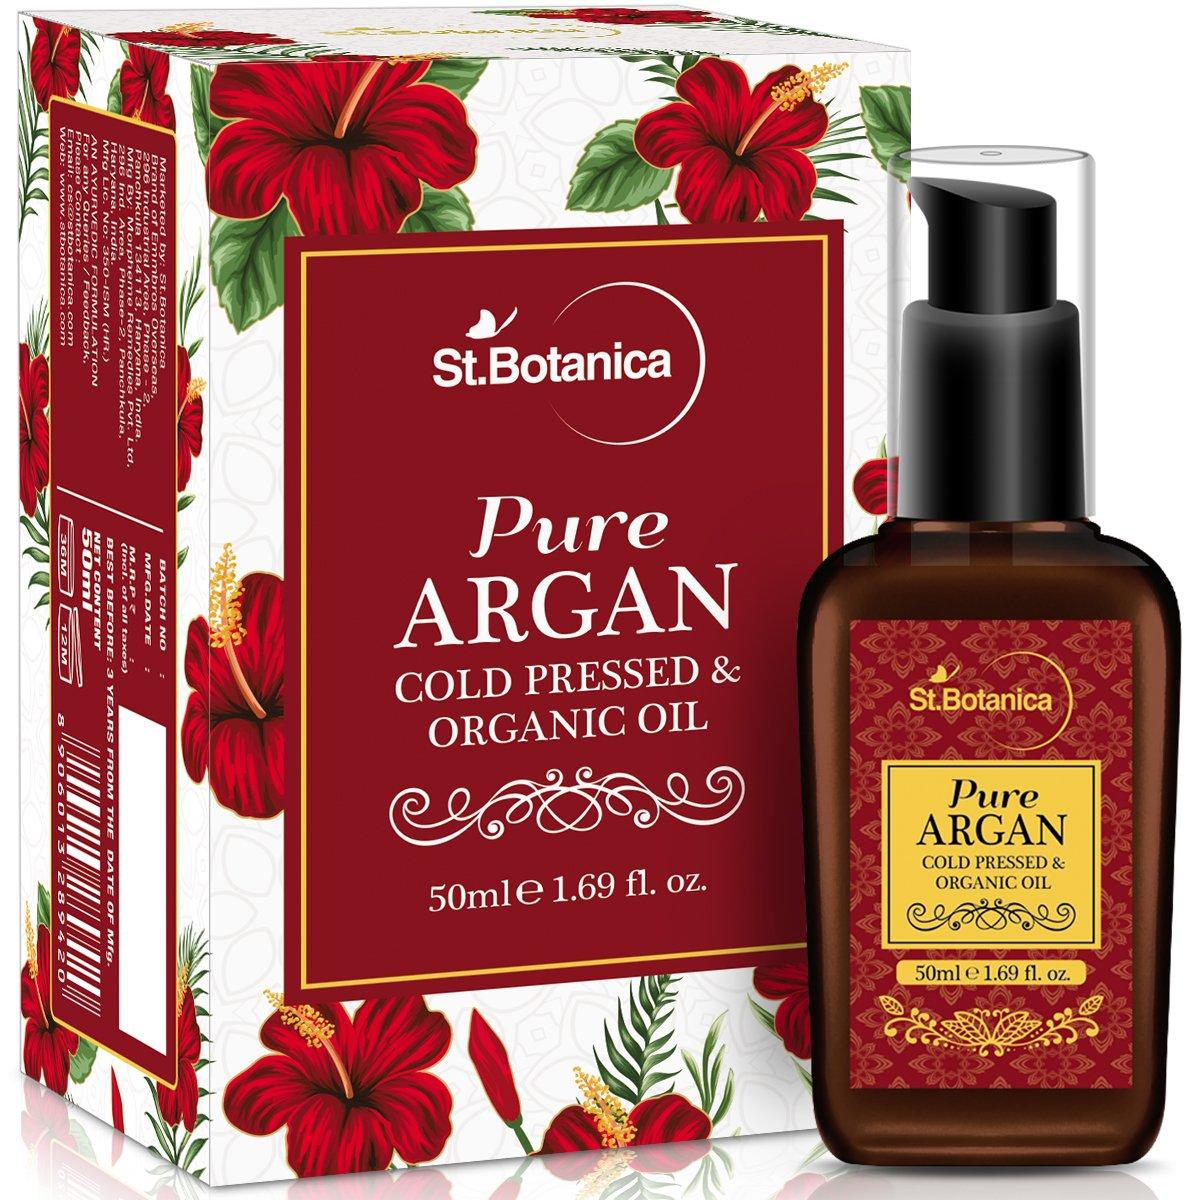 Stbotanica Organic Moroccan Argan Pure Coldpressed Oil 50Ml